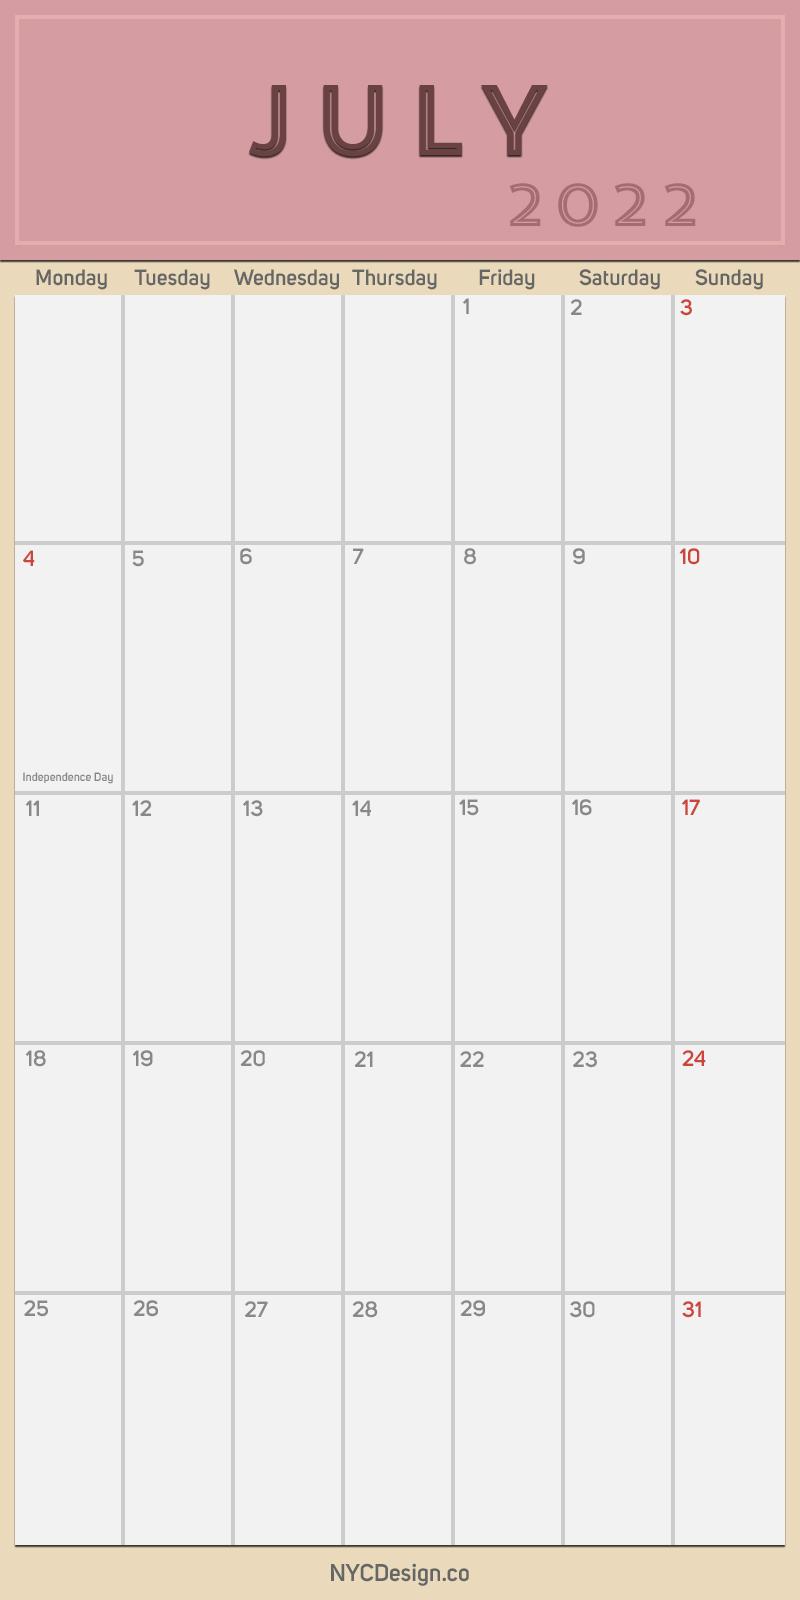 2022 July - Monthly Calendar, Planner, Printable Free ...